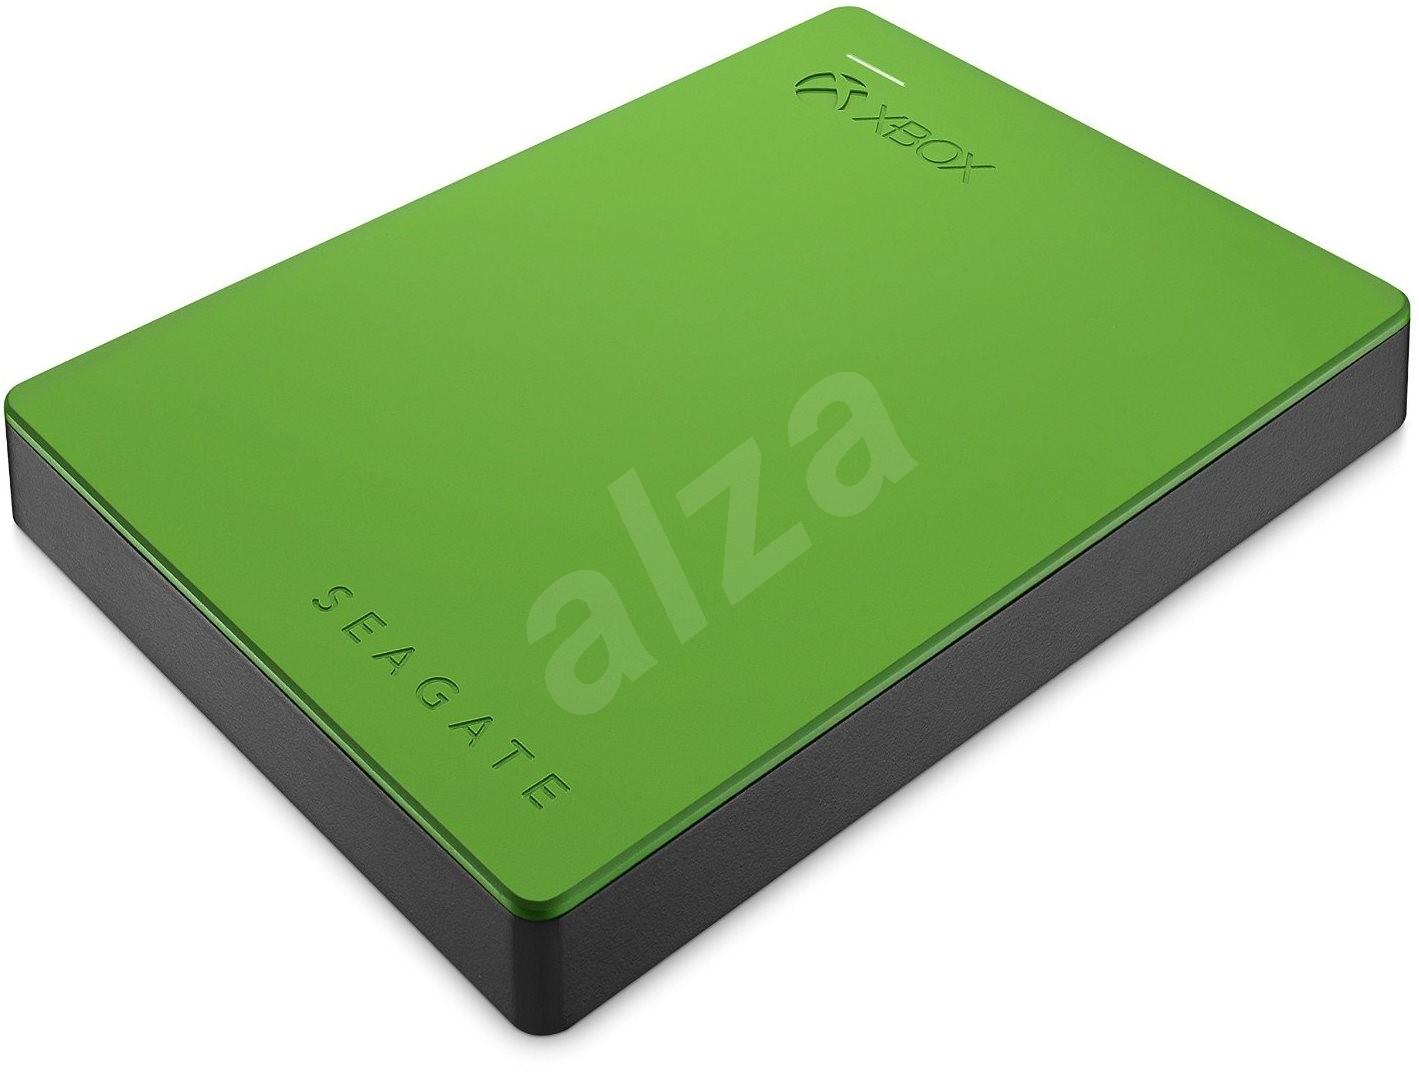 xbox game drive seagate 4tb externe festplatte. Black Bedroom Furniture Sets. Home Design Ideas